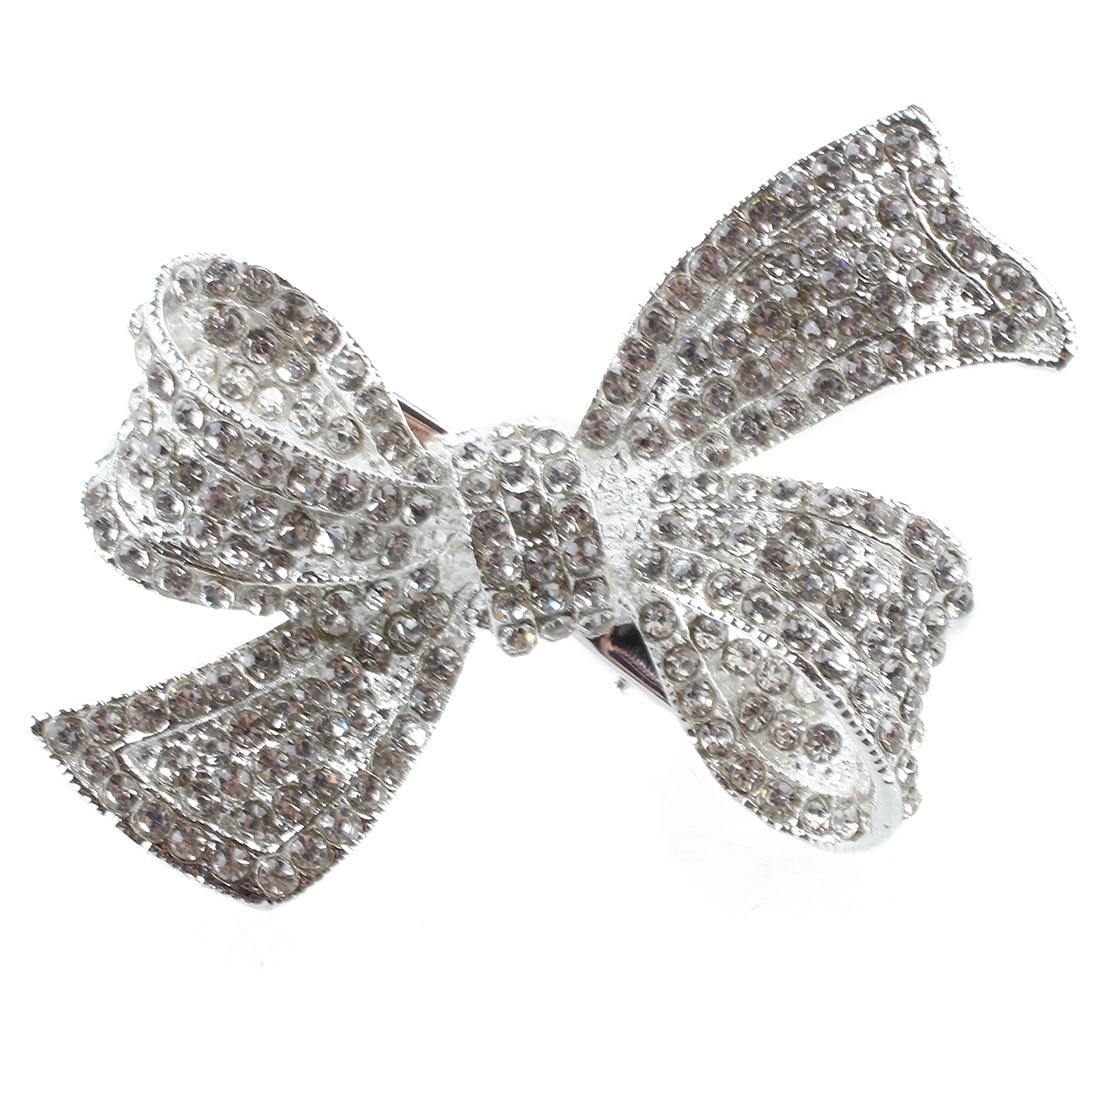 MYPF-Silver plate rhinestone knot hair clip 54MM gils decoration